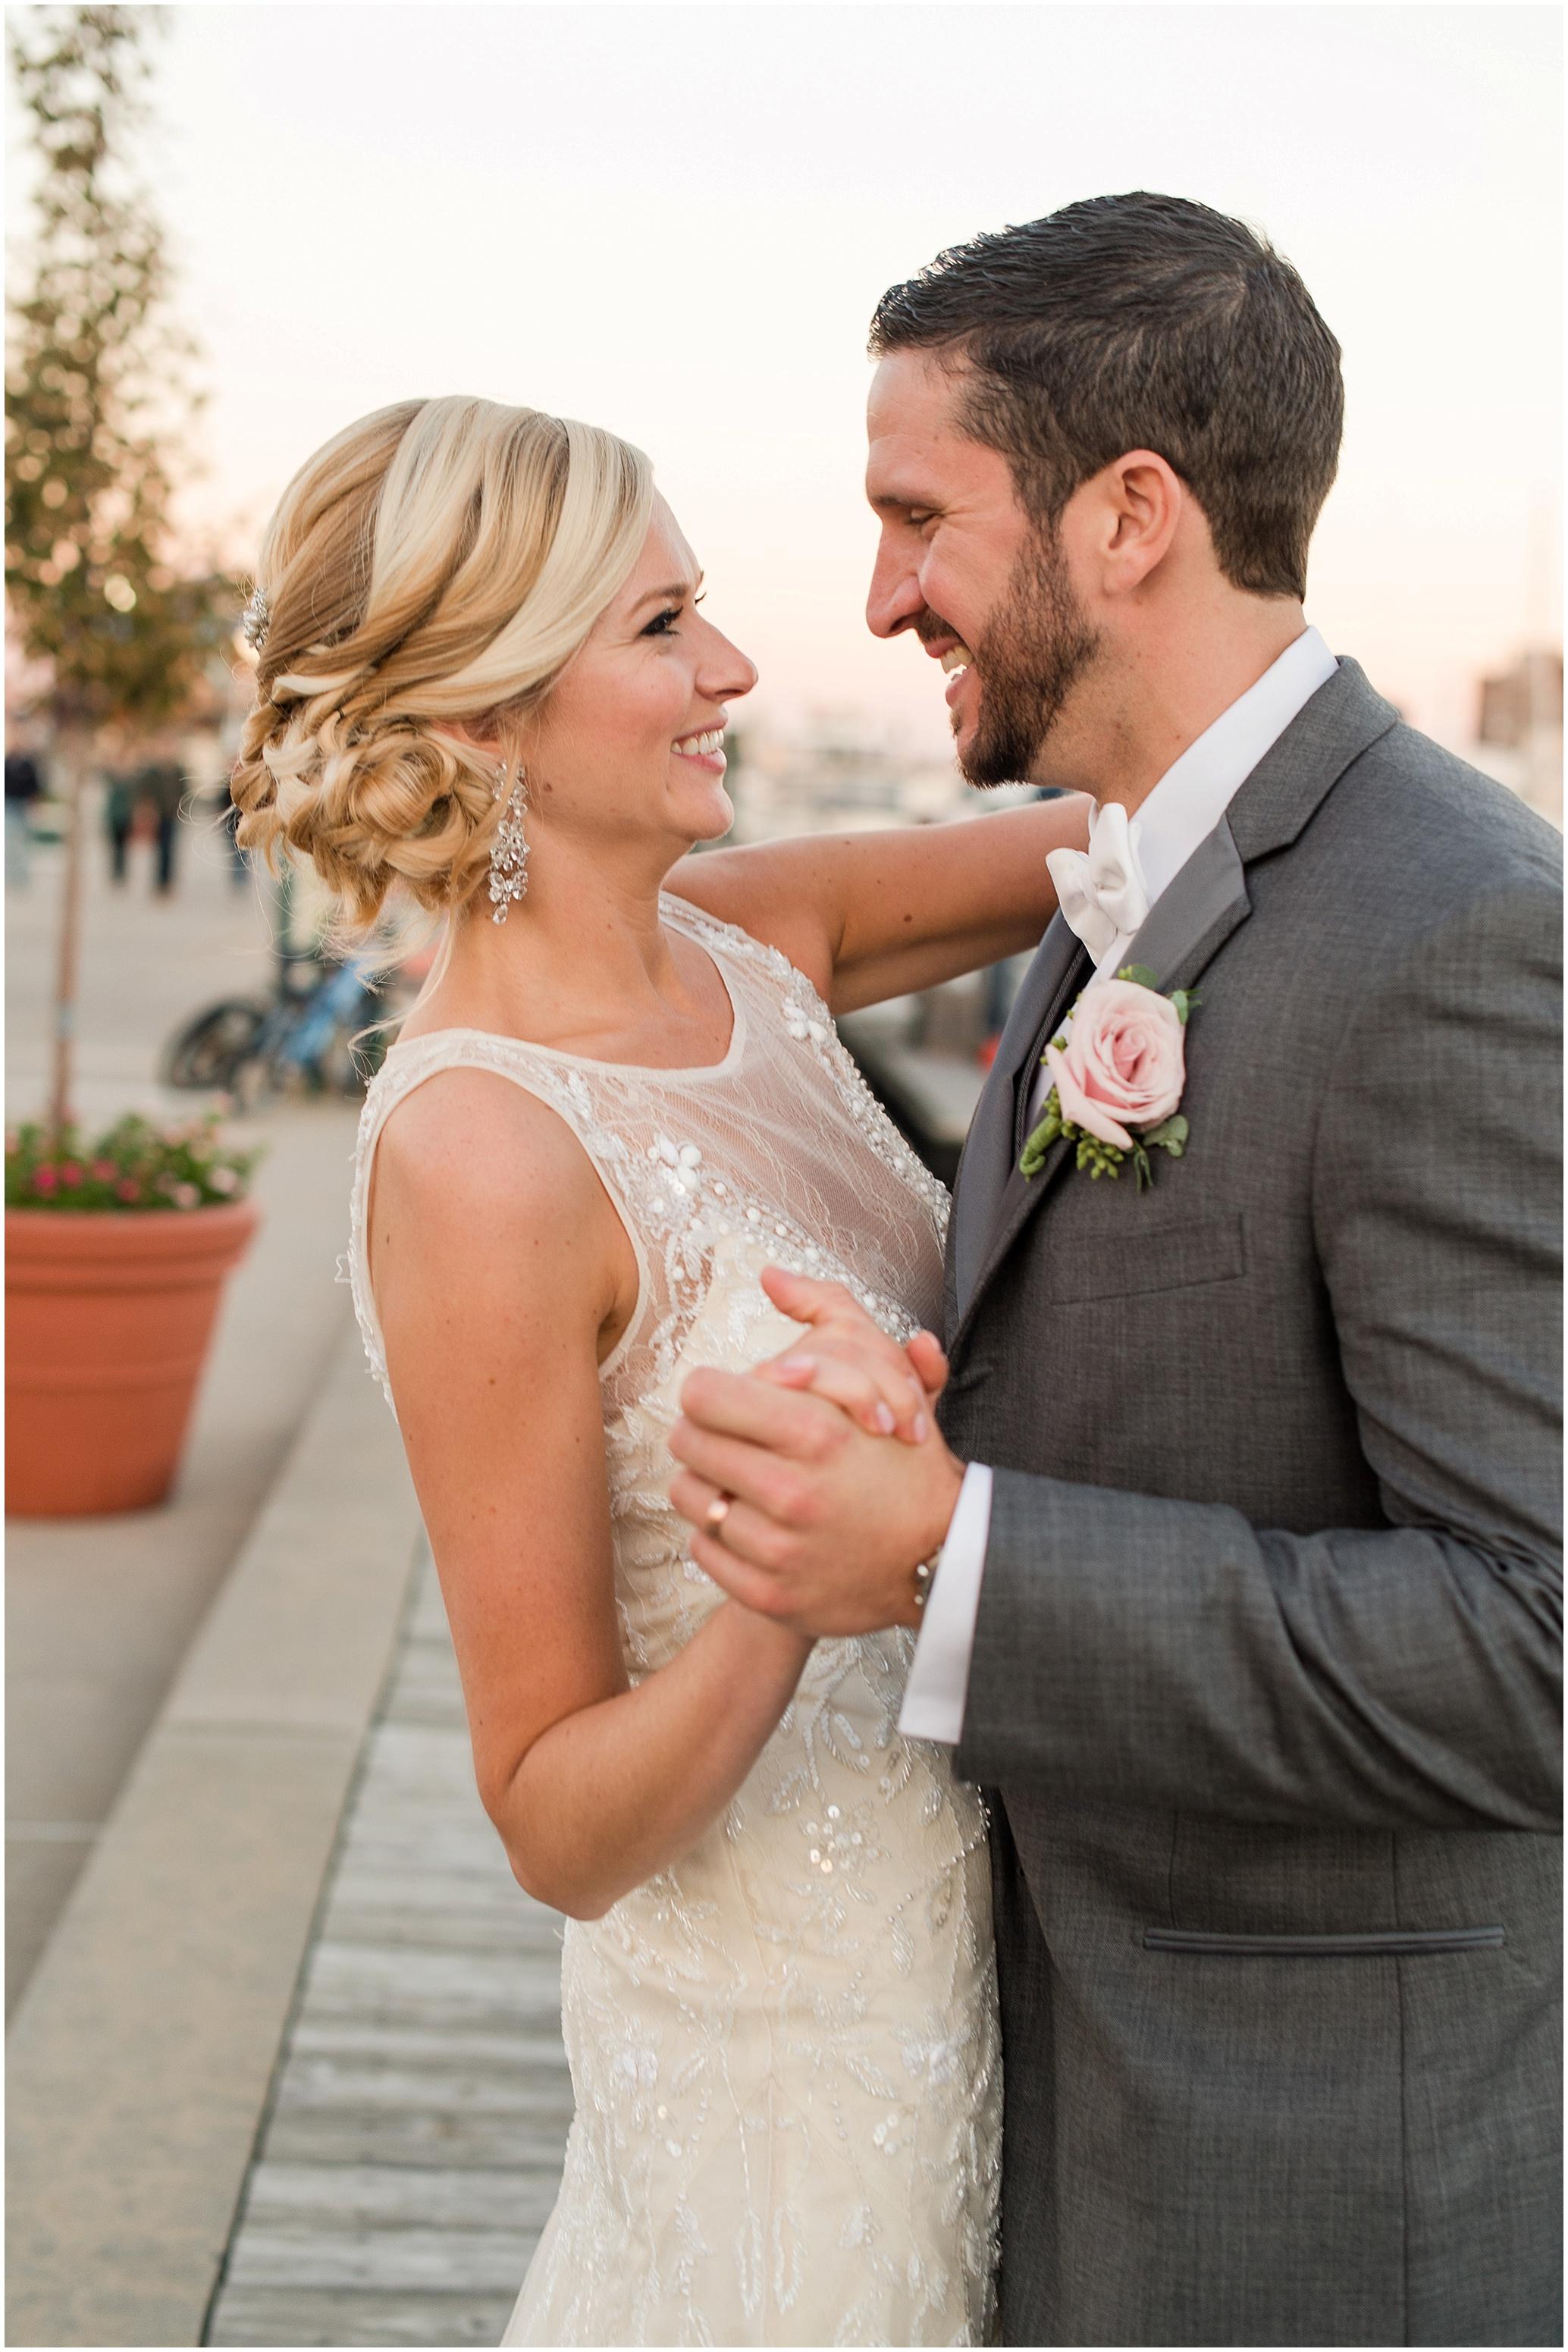 Hannah Leigh Photography Tabrizis Baltimore Wedding_2266.jpg